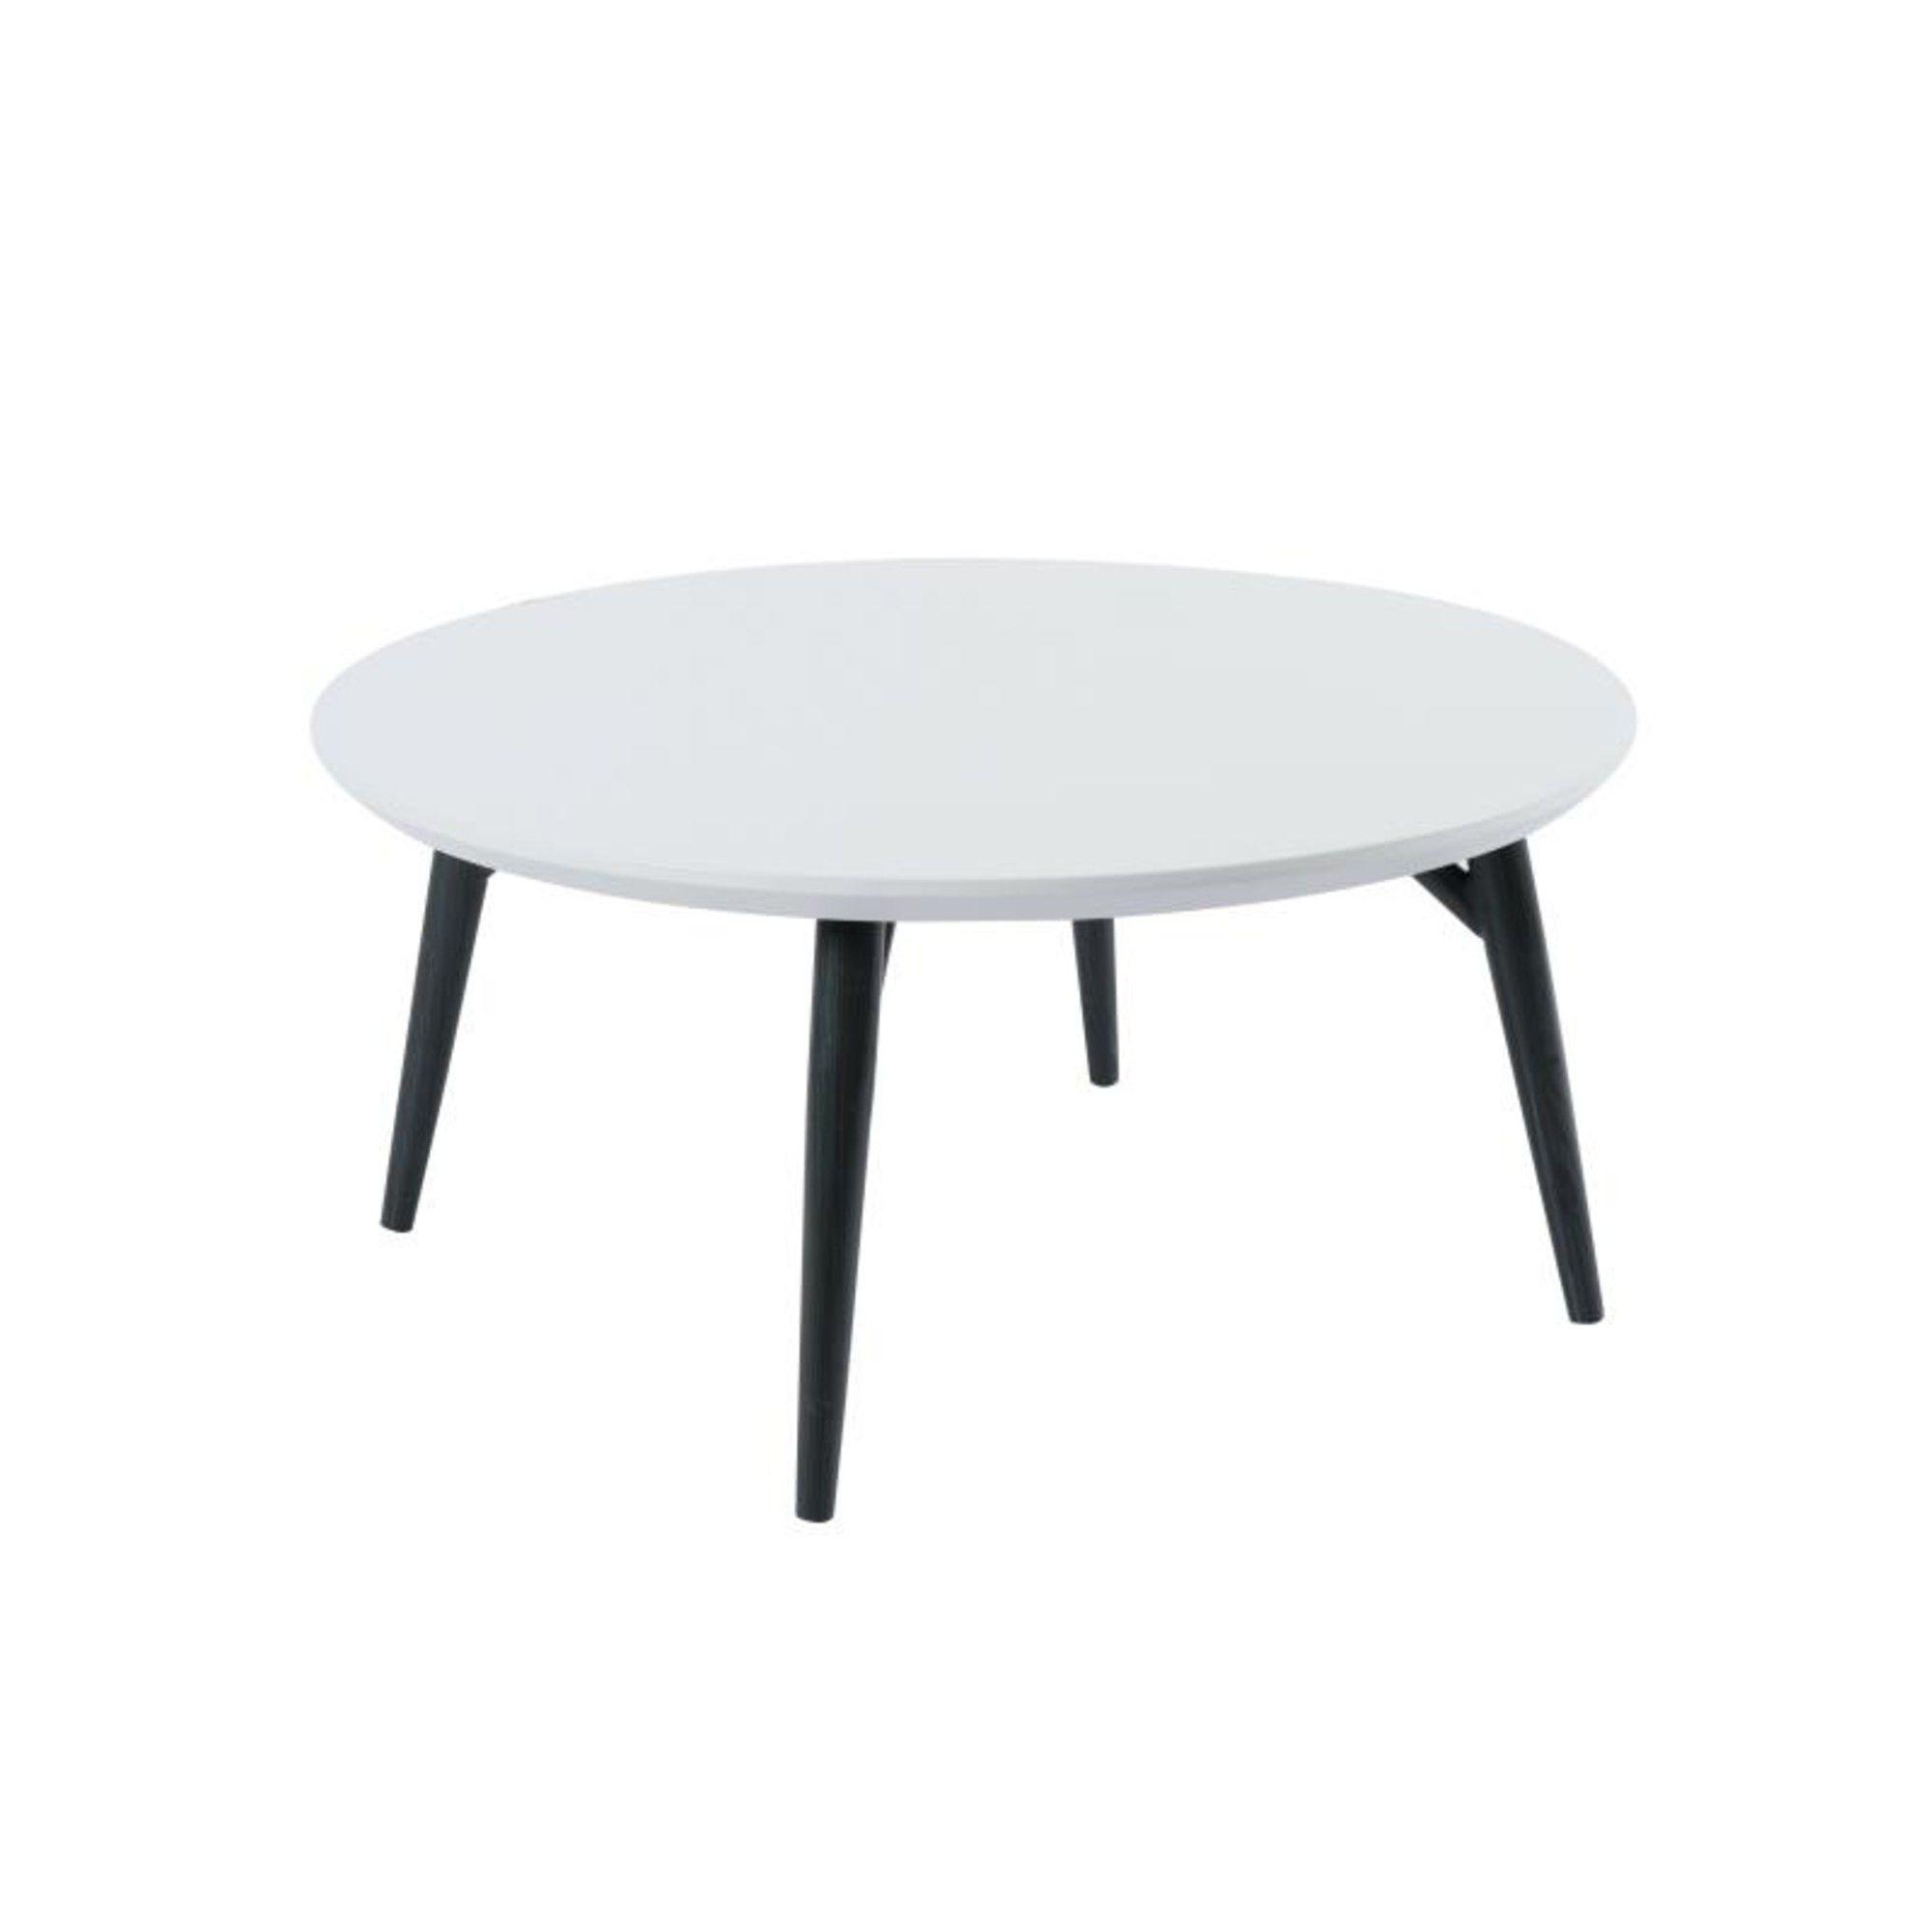 Orbit Circular Coffee Table with a Light Grey Matt Finish